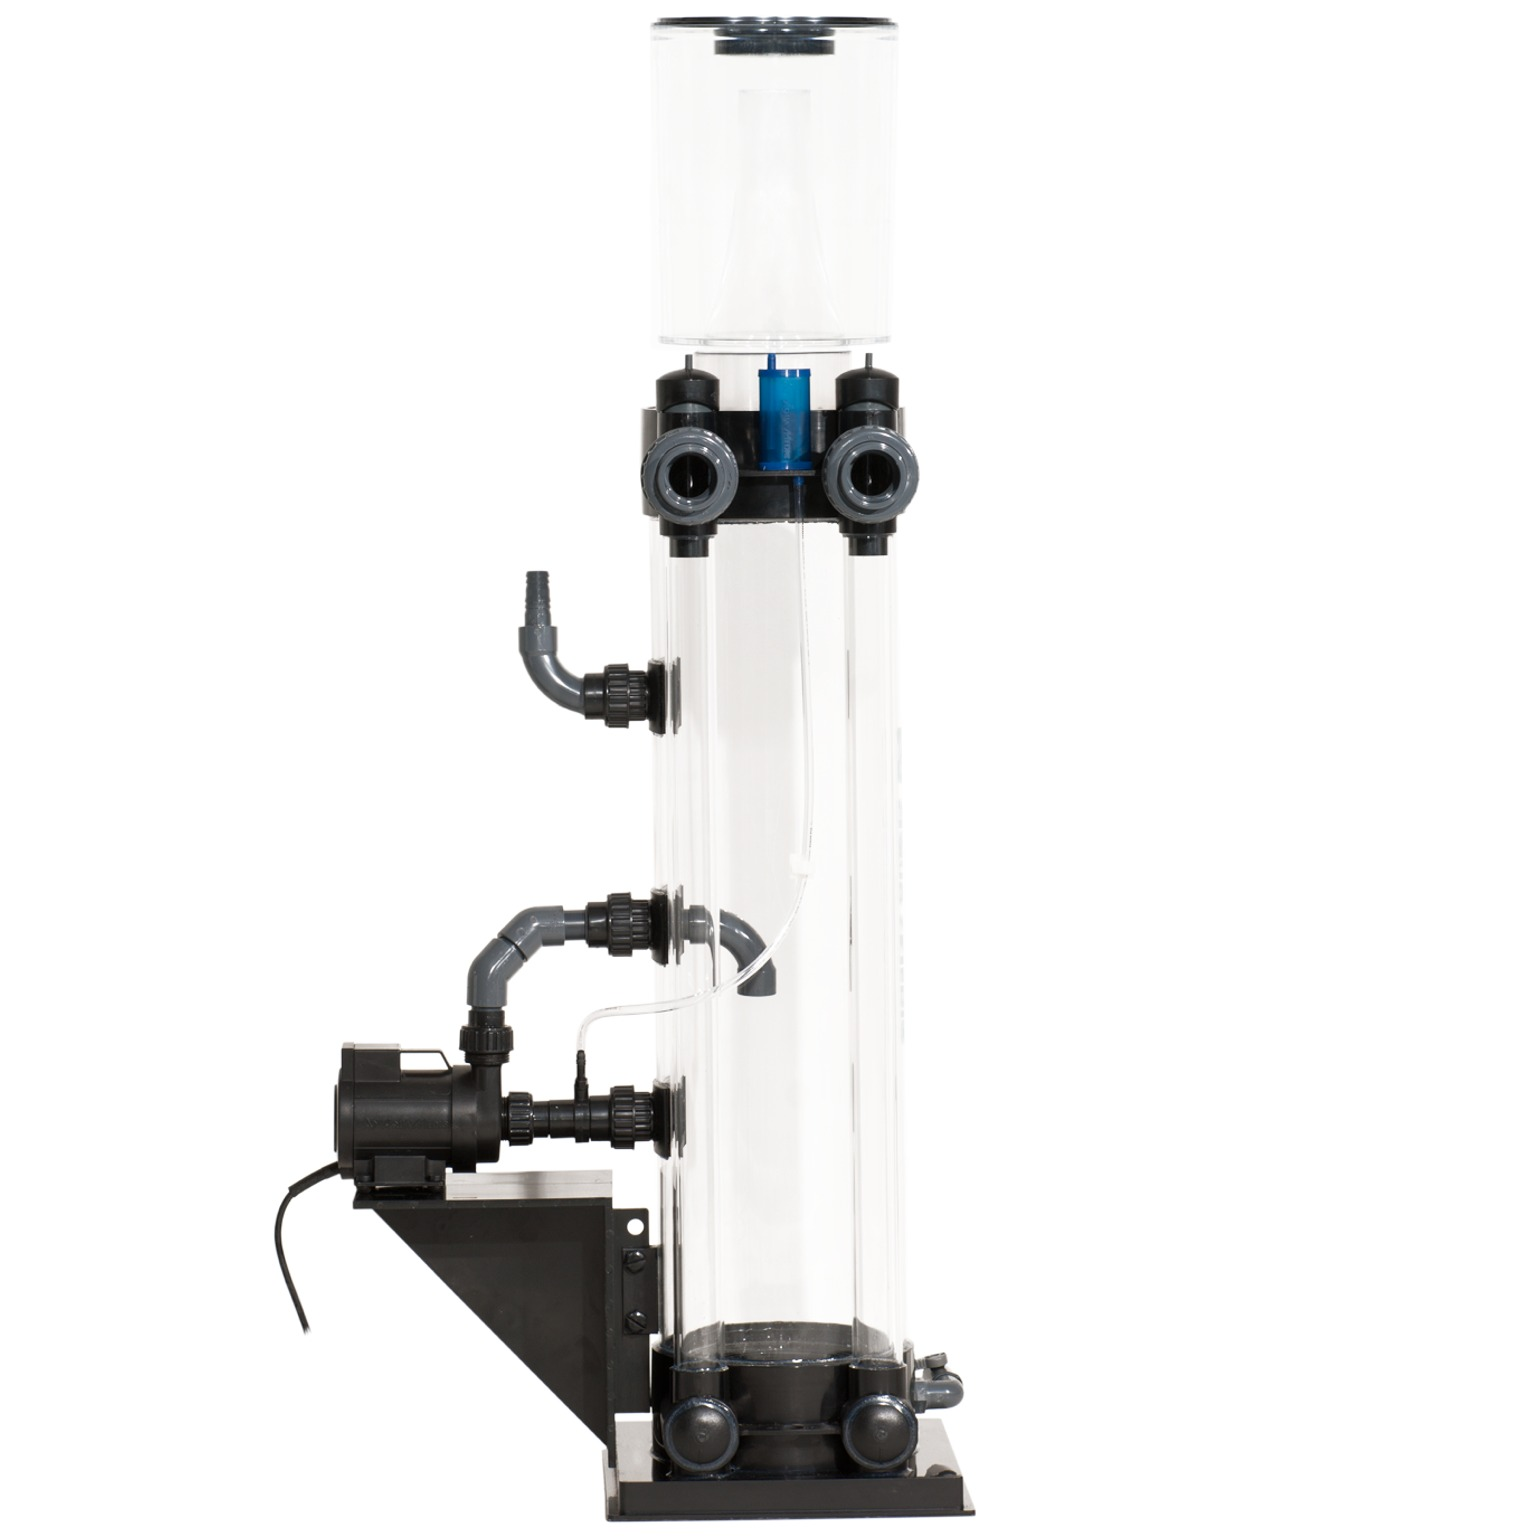 AQUA MEDIC Turboflotor 5000 Baby ECO écumeur externe pour aquarium jusqu\'à 3000 L